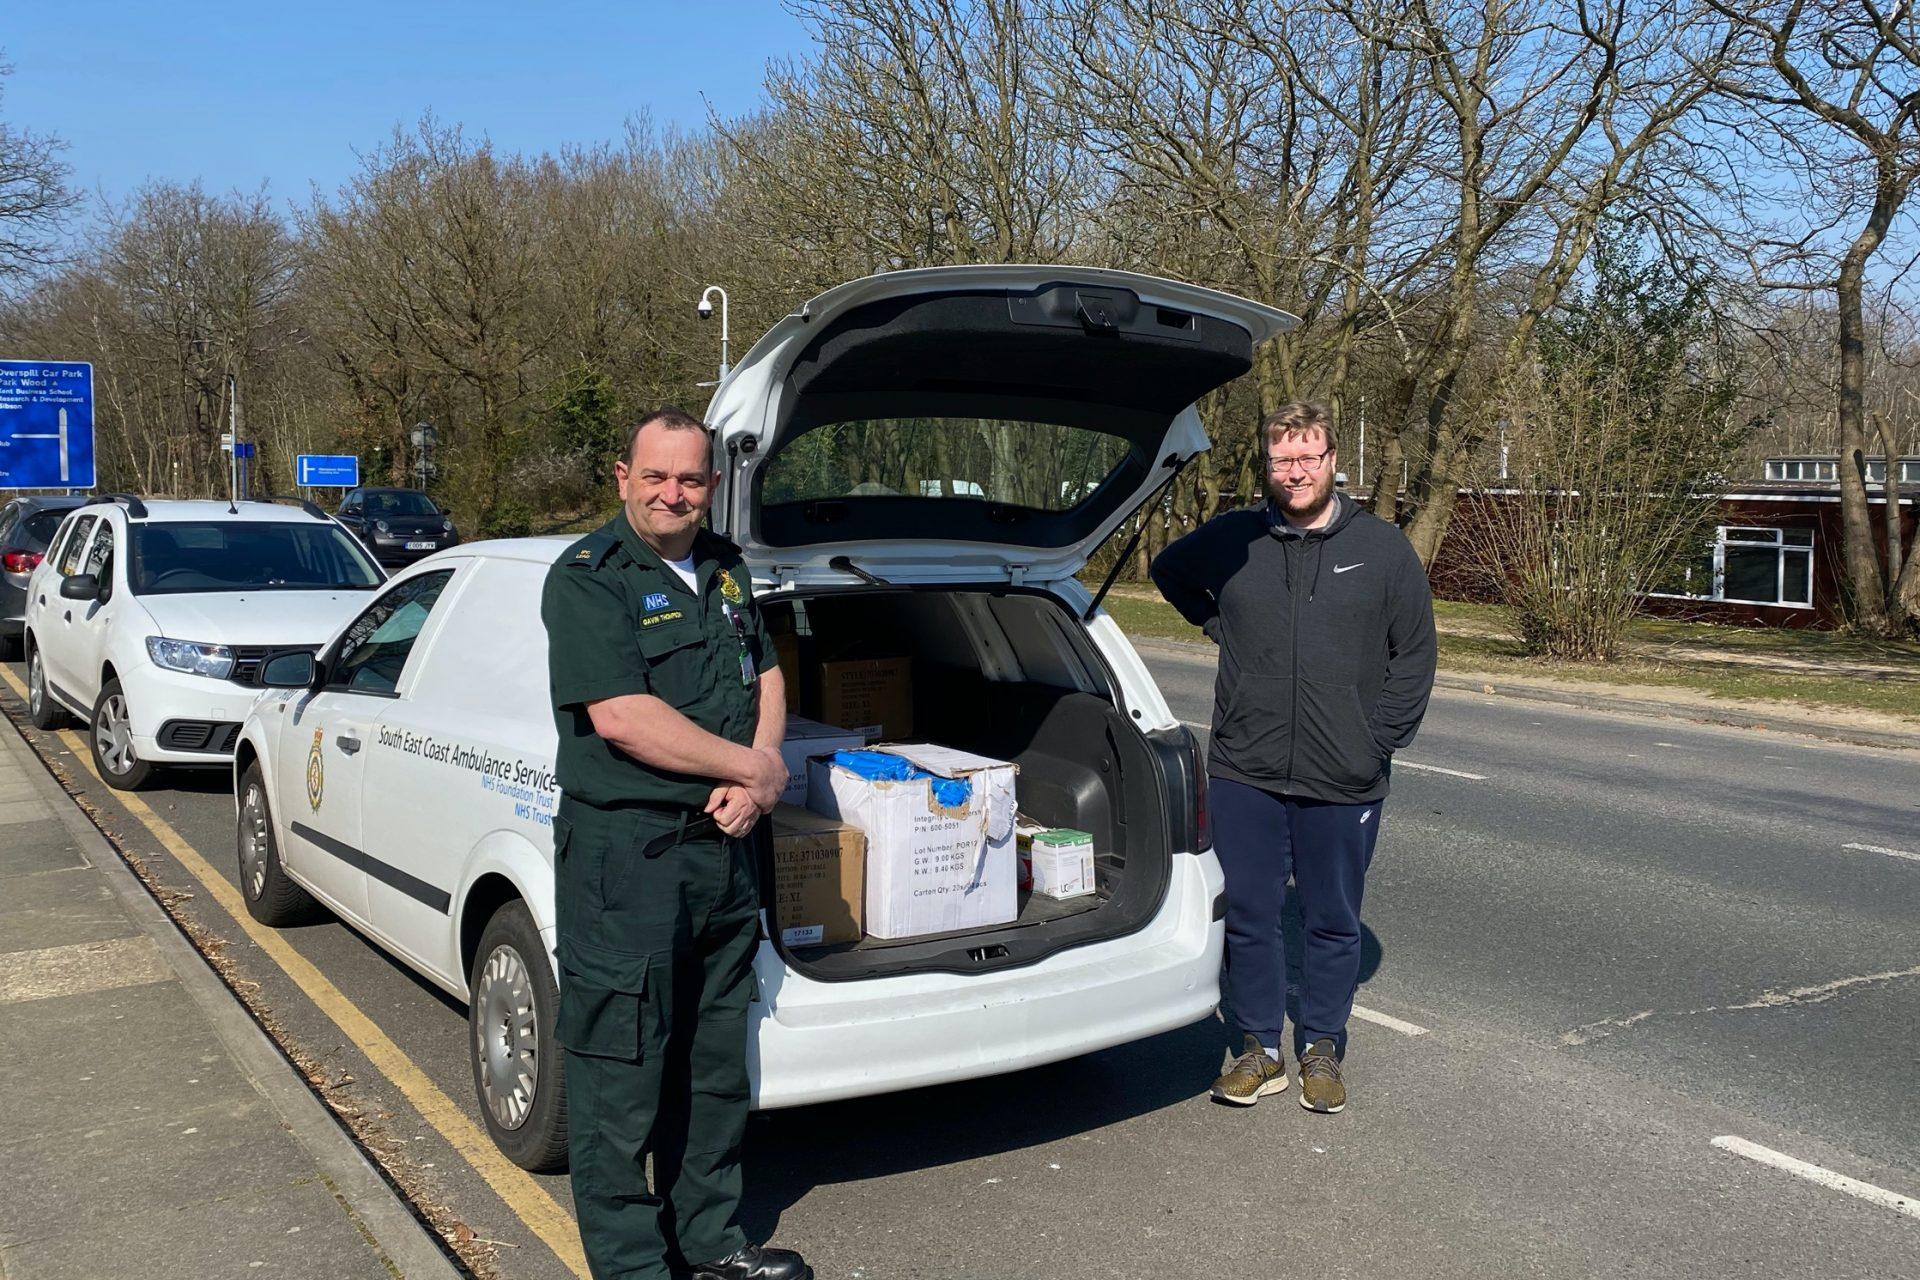 Gavin Thompson, South East Coast Ambulance Service NHS Foundation Trust (left), Dr Chris Shepherd (right)